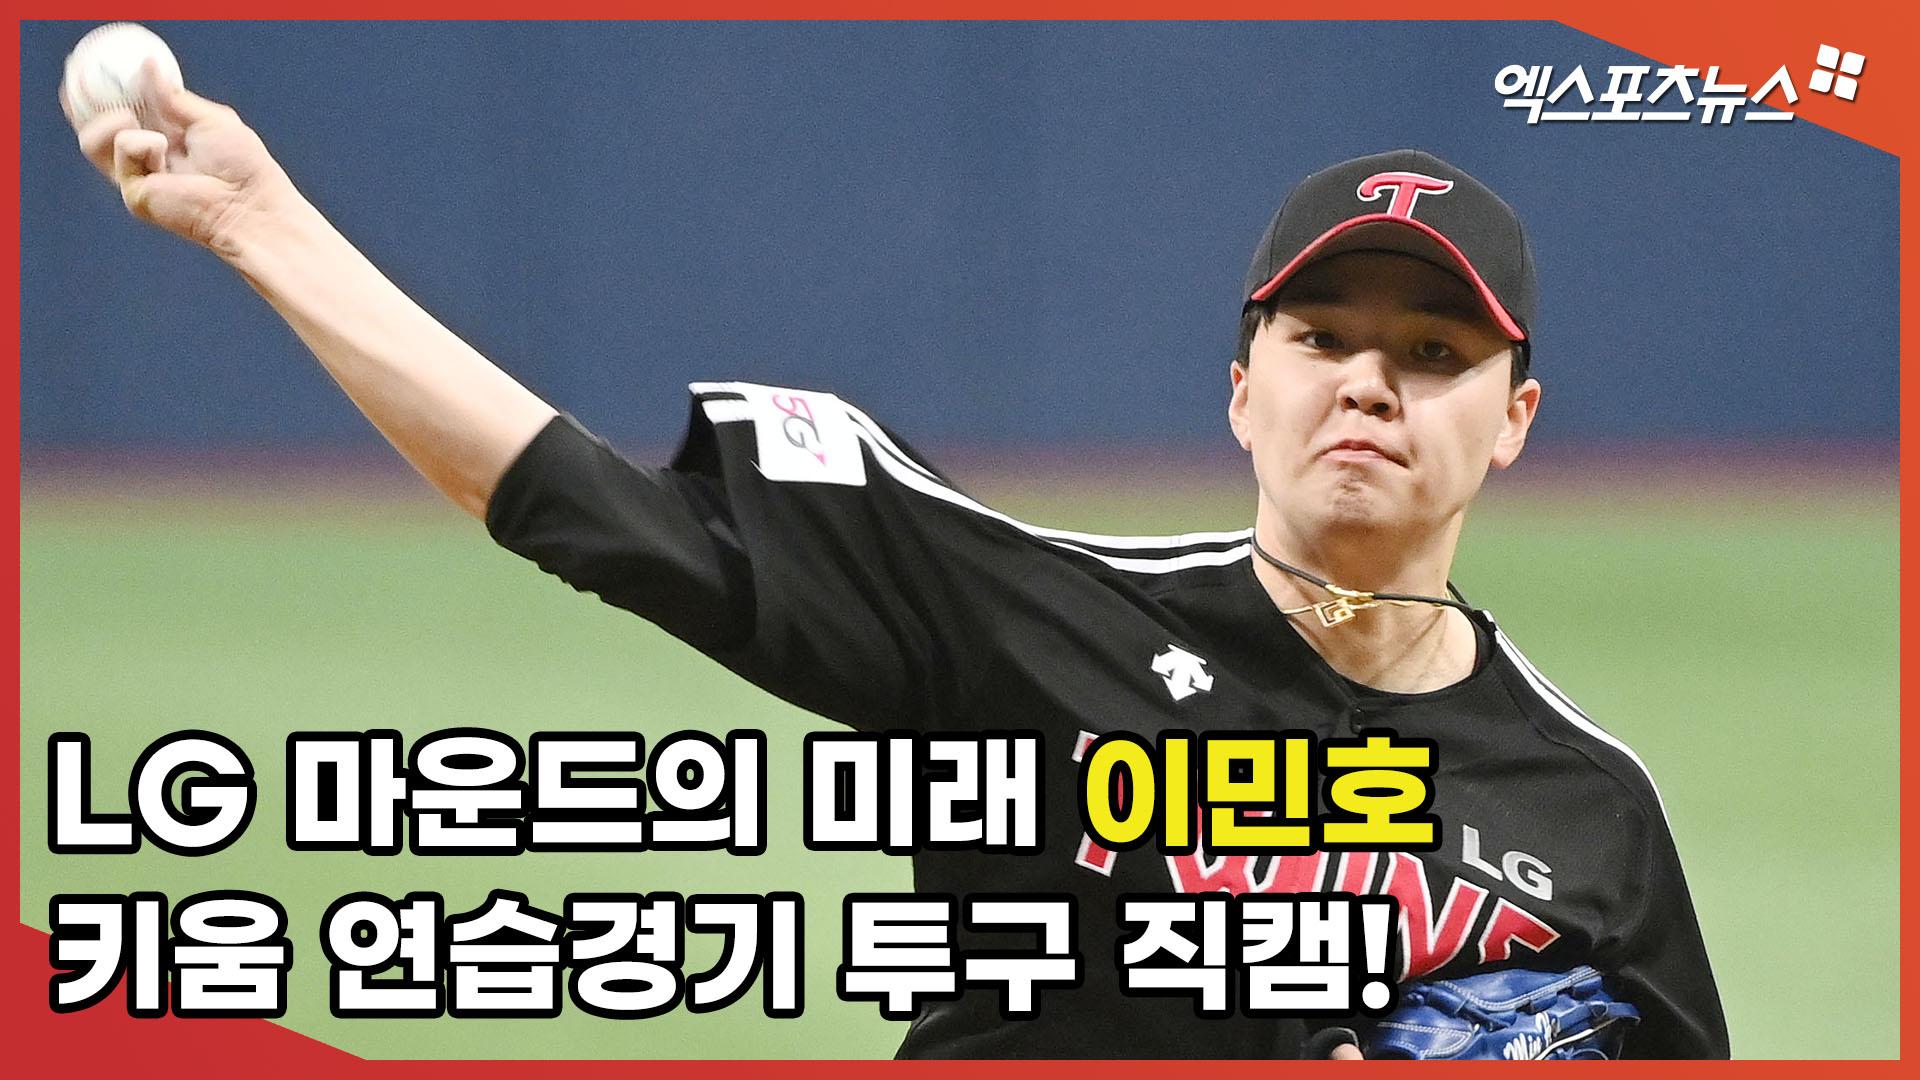 LG 마운드의 미래 이민호, 키움 연습경기 투구 직캠! [엑's 영상]